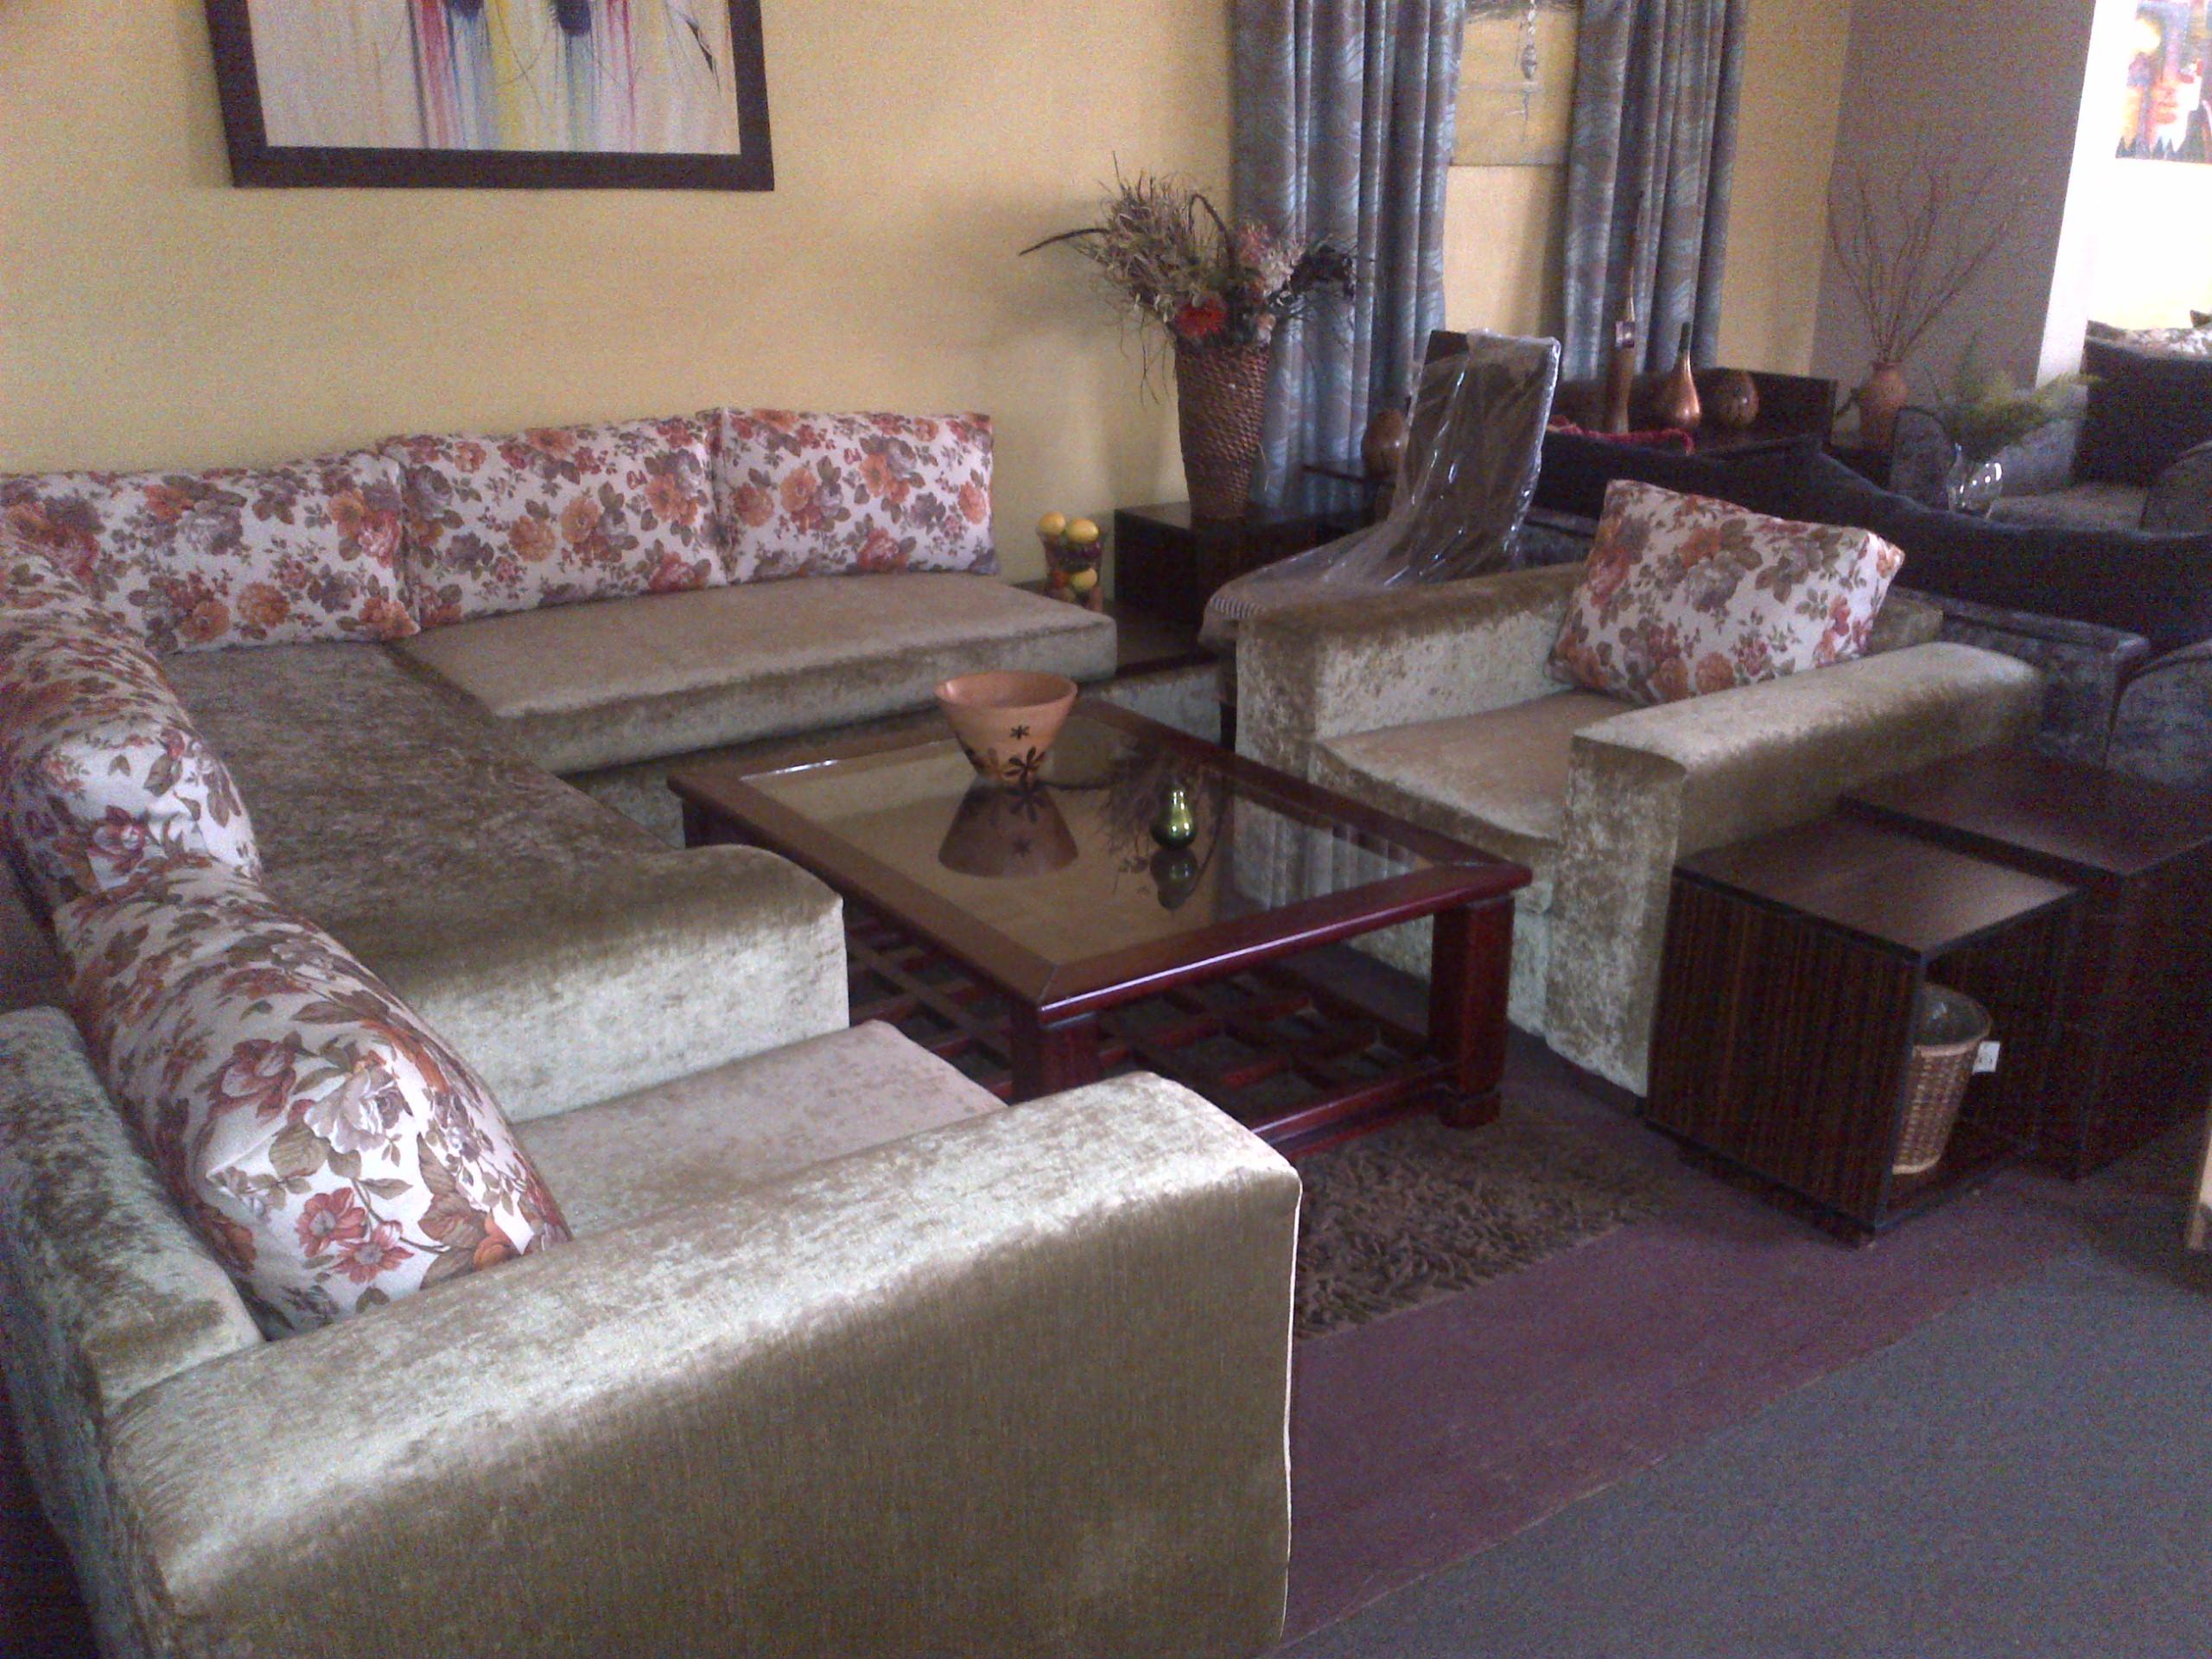 Swell Sectional Sofa Diana Sofa Beatyapartments Chair Design Images Beatyapartmentscom